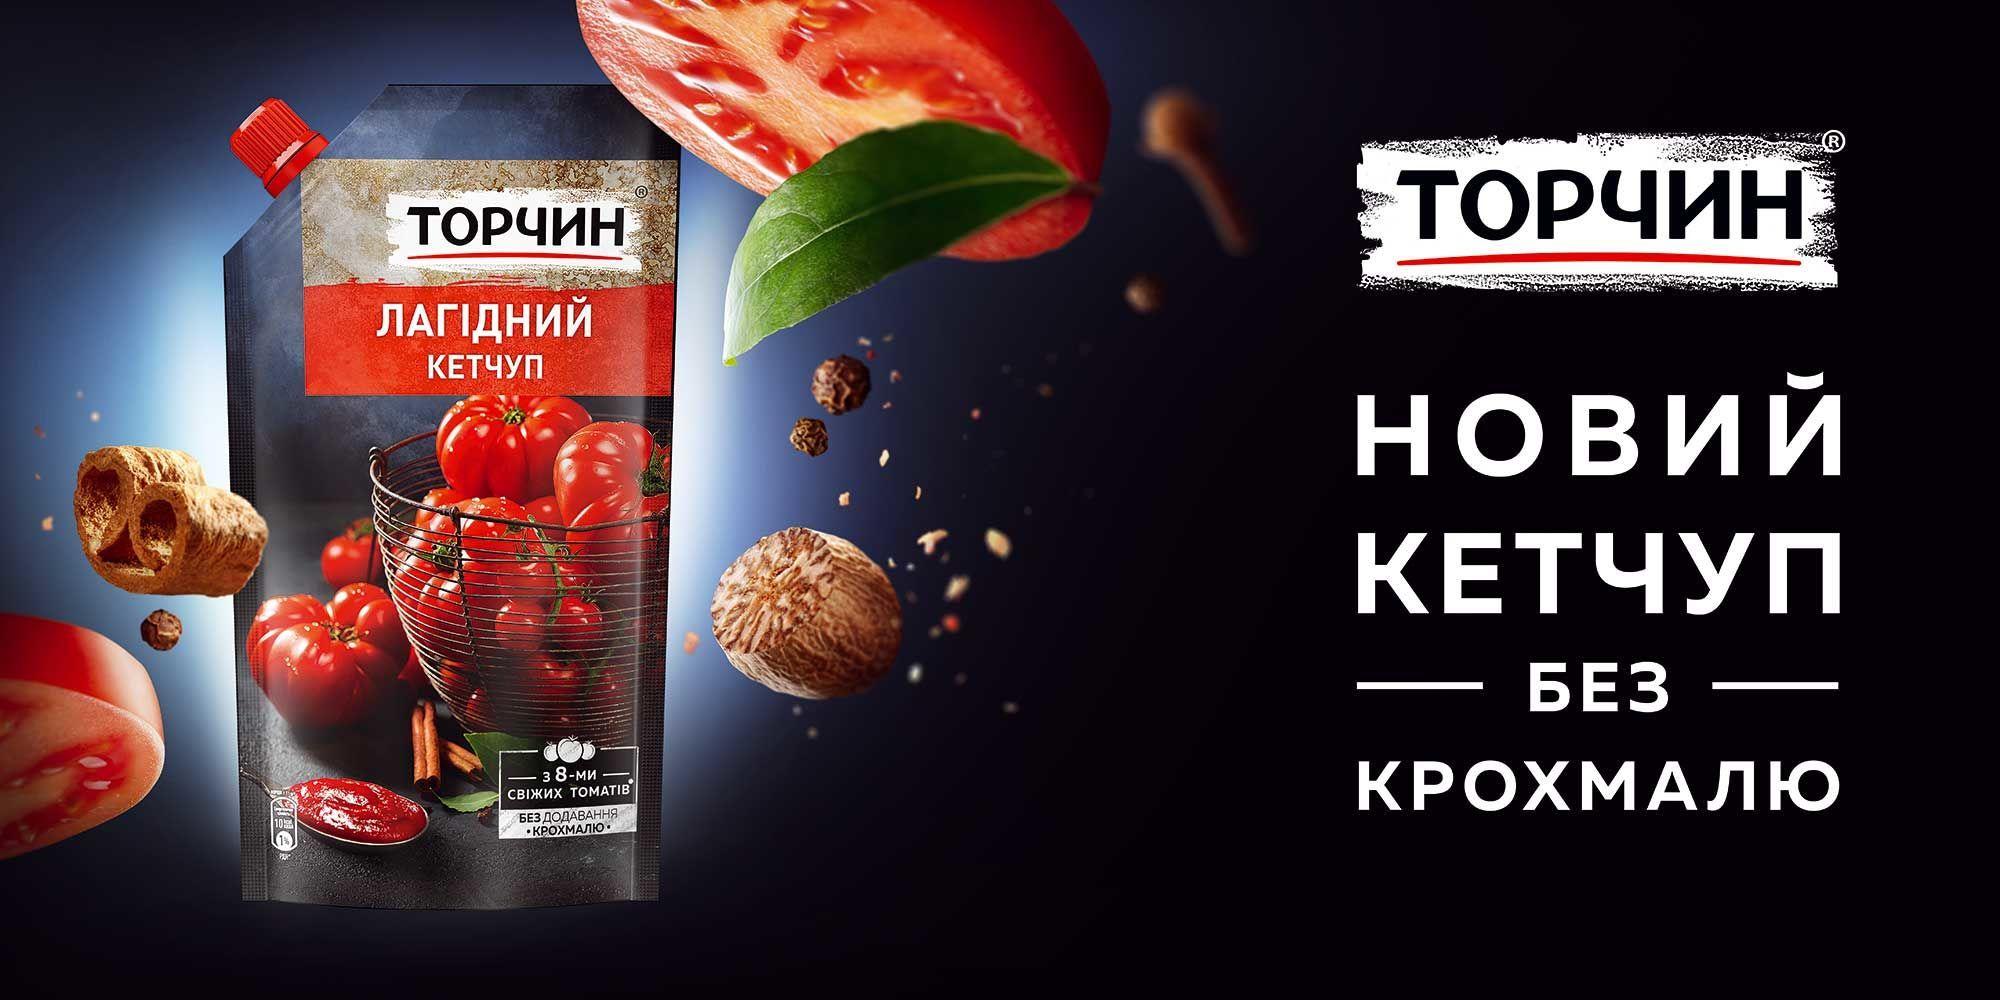 Кетчуп ТМ Торчин®